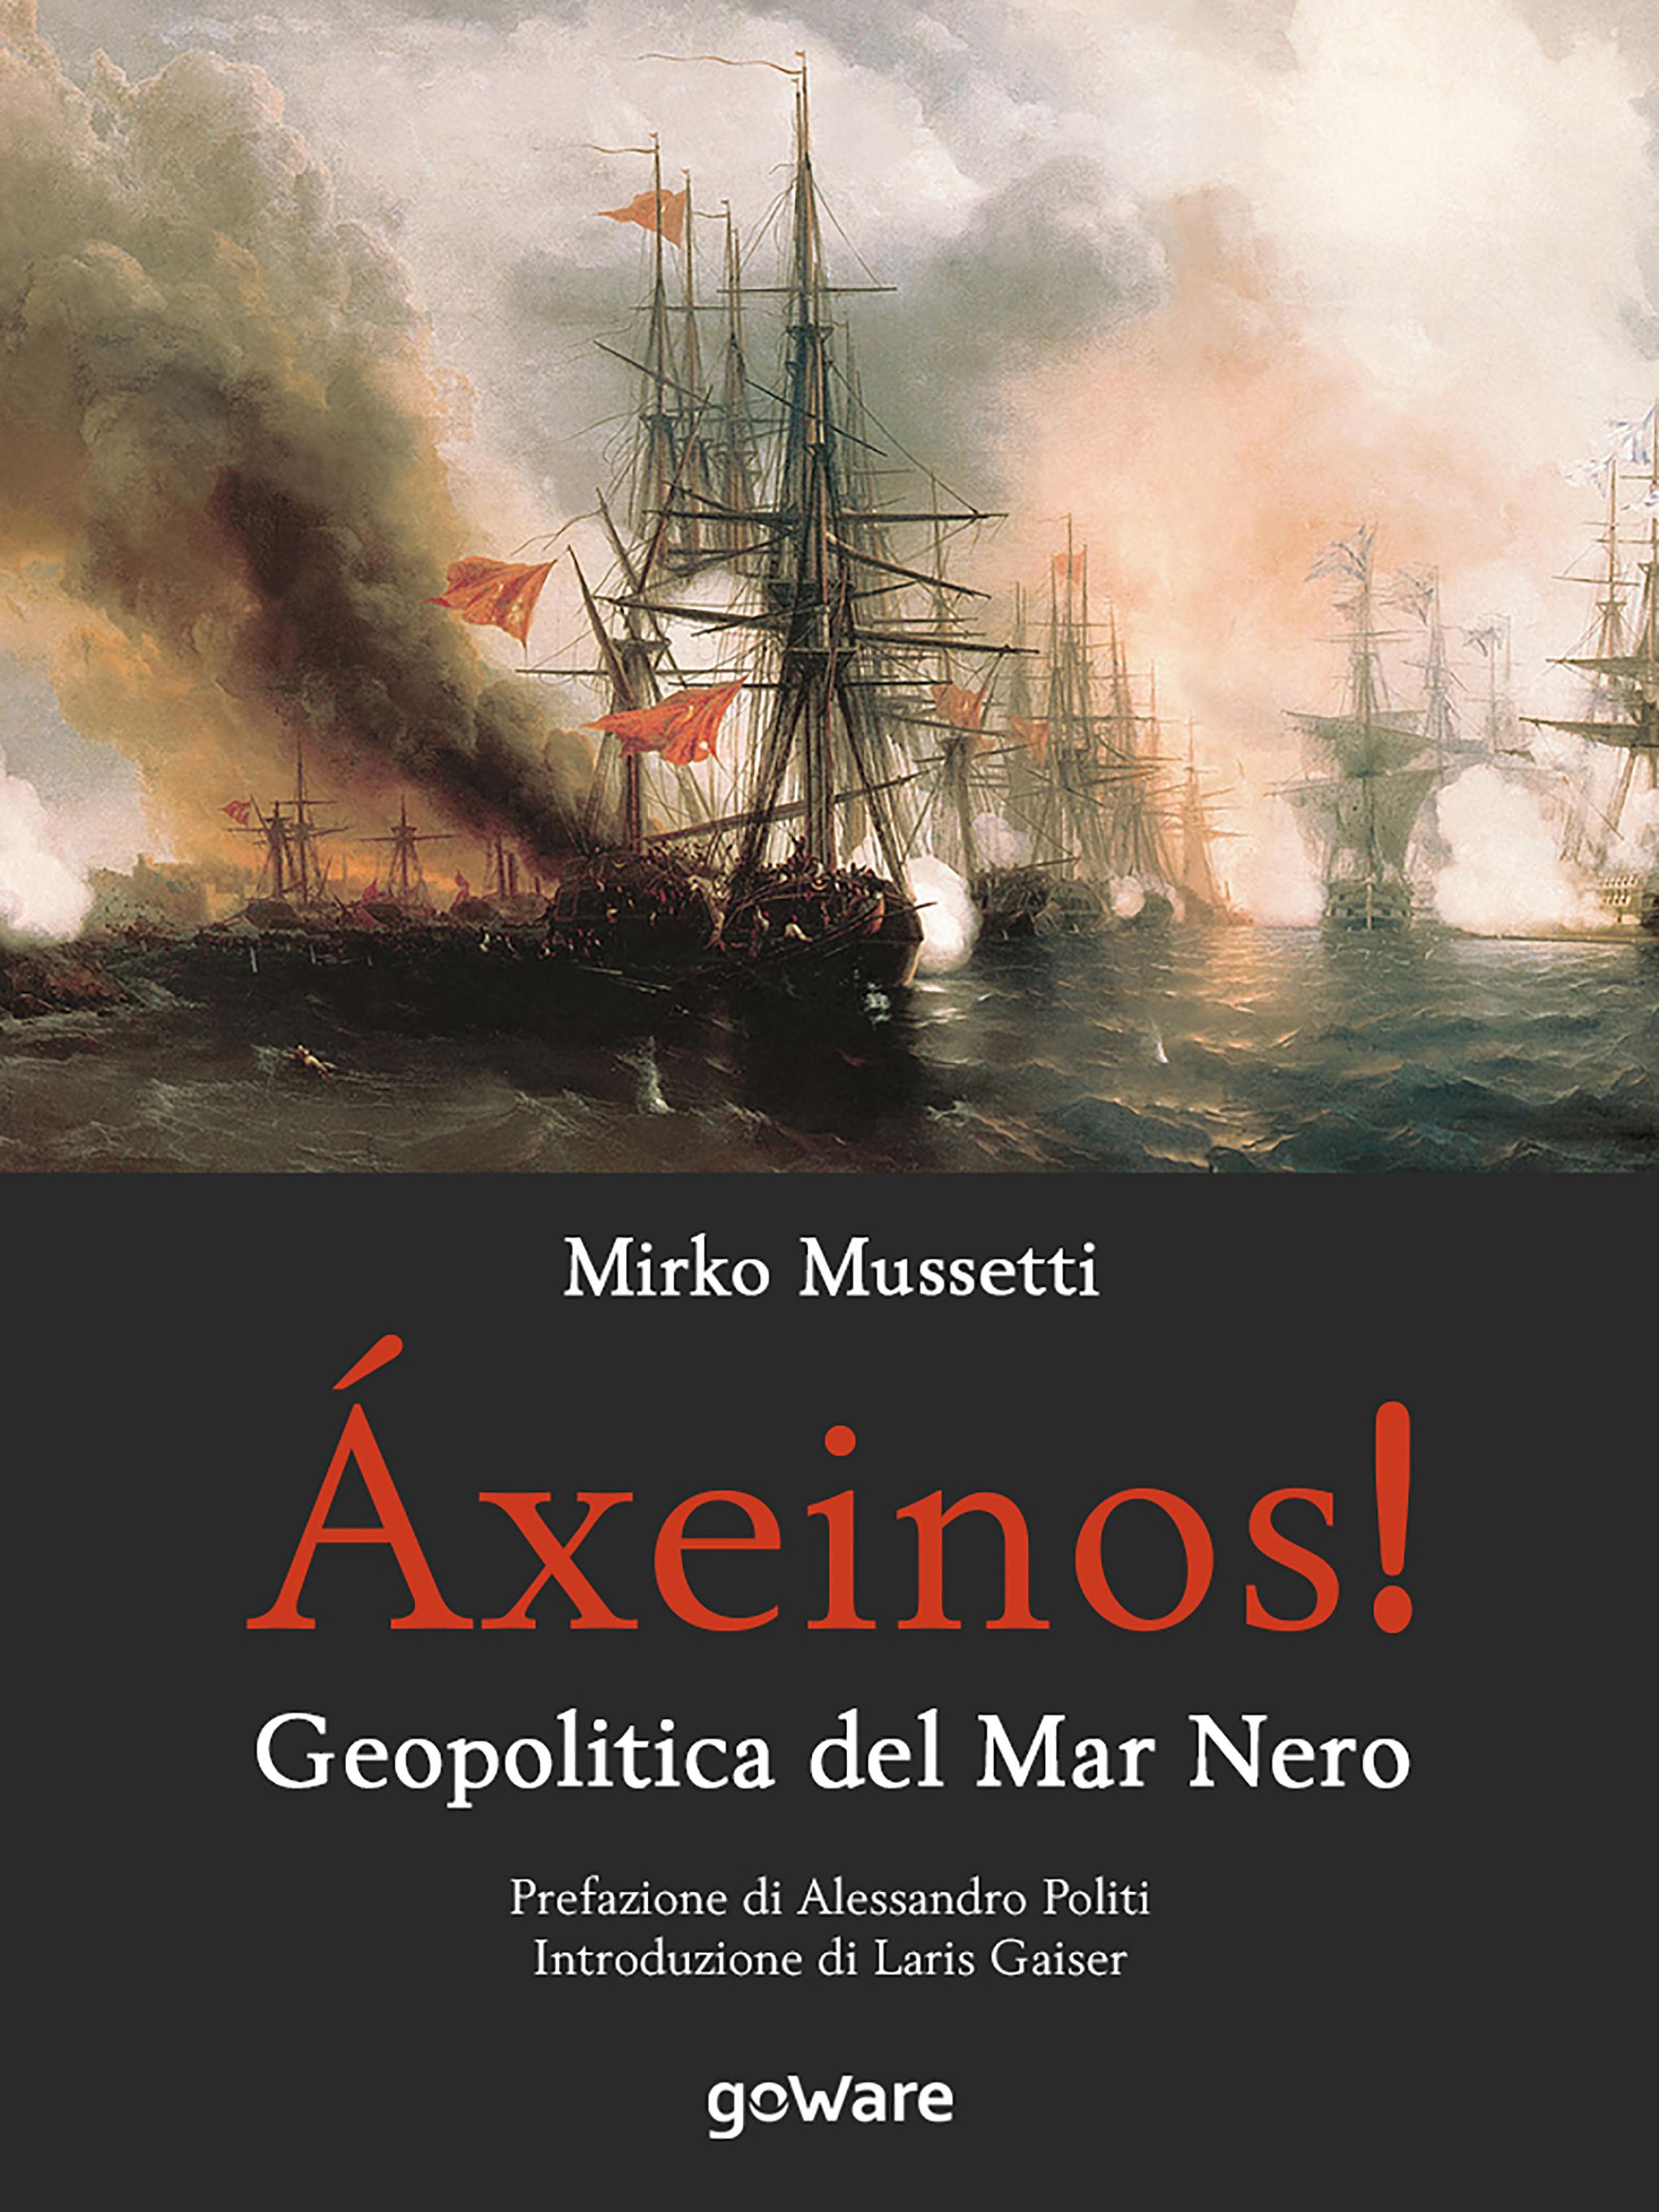 "<strong><a href=""http://www.goware-apps.com/axeinos-geopolitica-del-mar-nero-mirko-mussetti/"">ÁXEINOS! GEOPOLITICA DEL MAR NERO</a></strong> Book Cover"